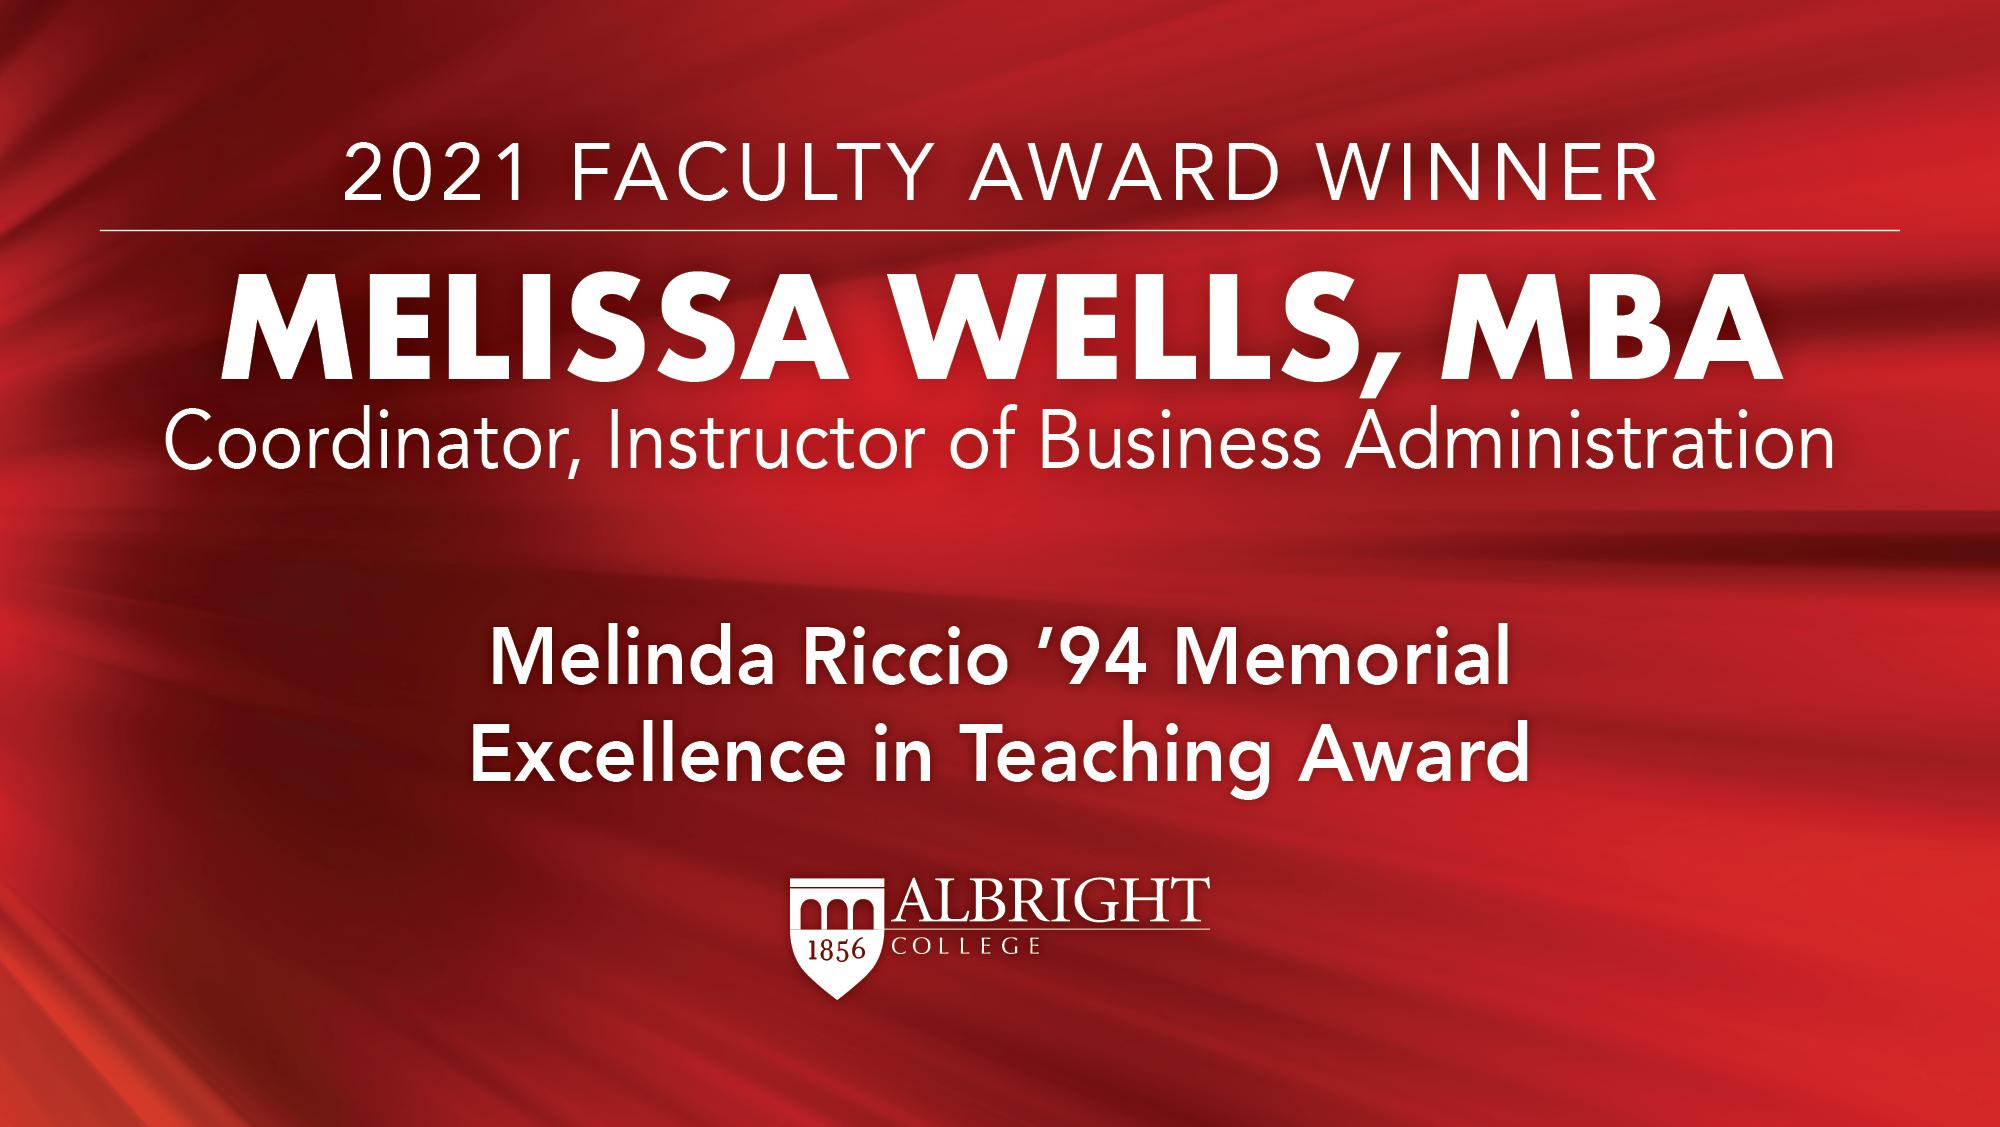 Melissa Wells, MBA